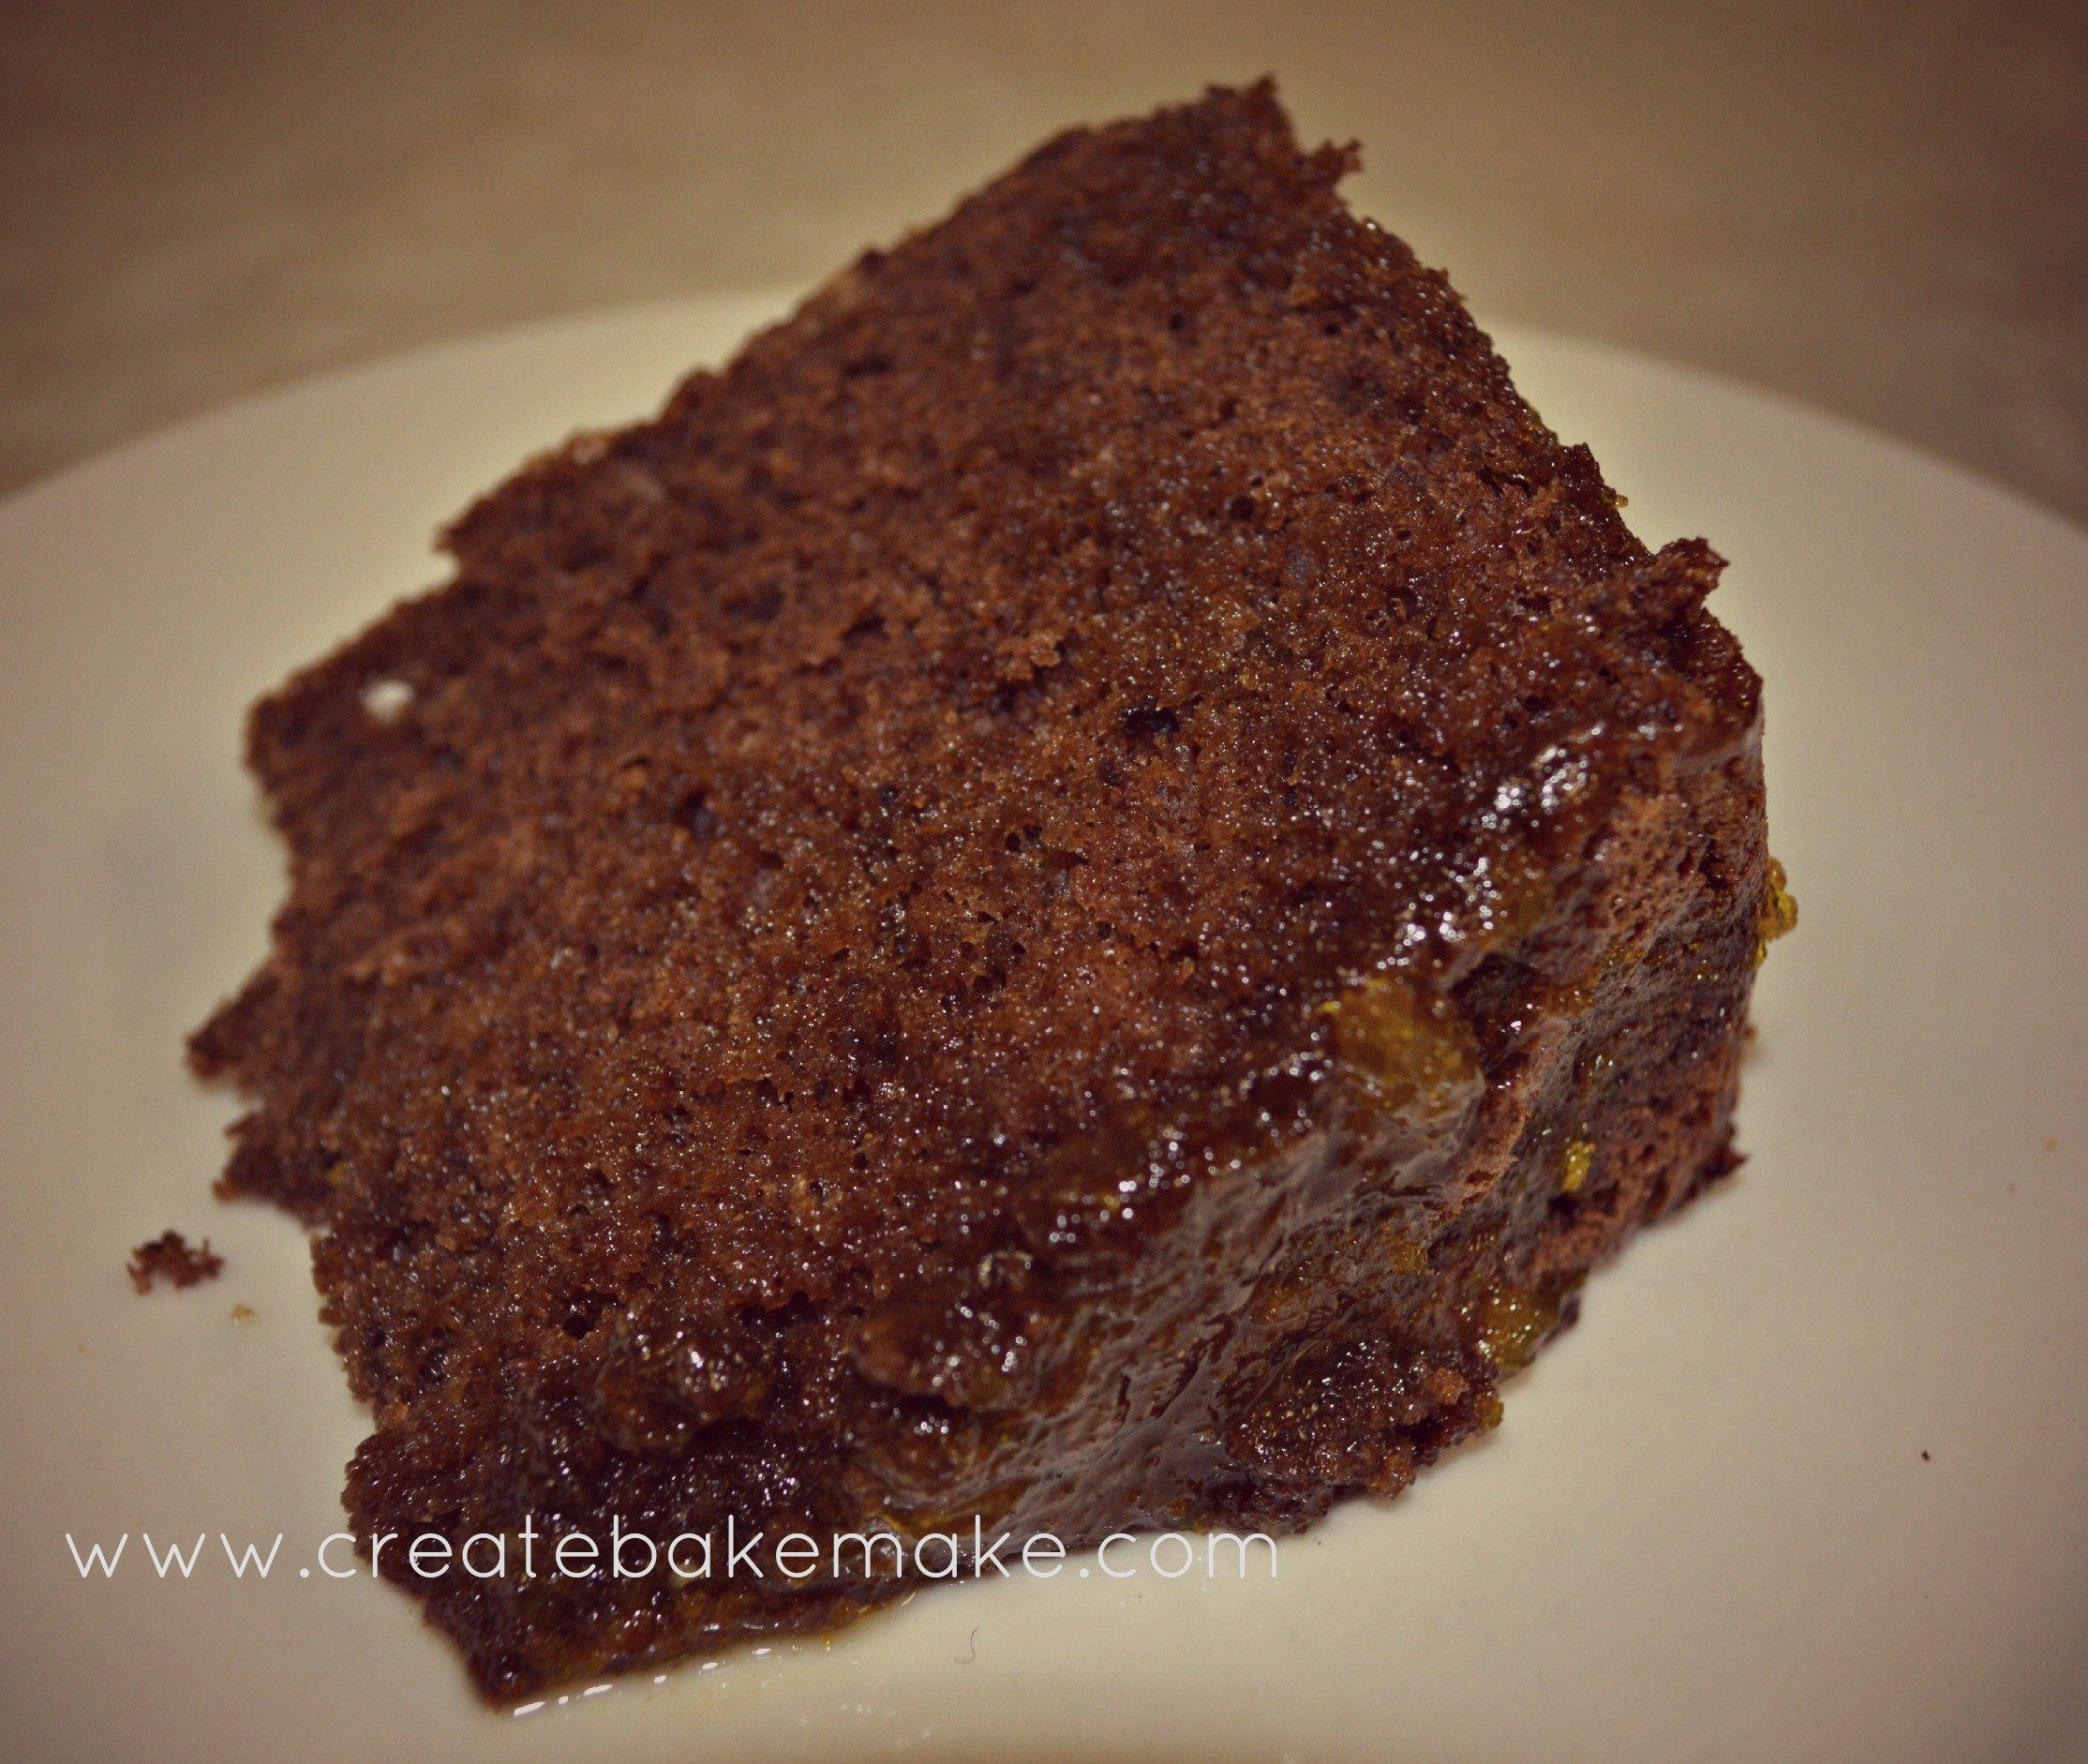 Chocolate Cake with Orange Syrup - Create Bake Make